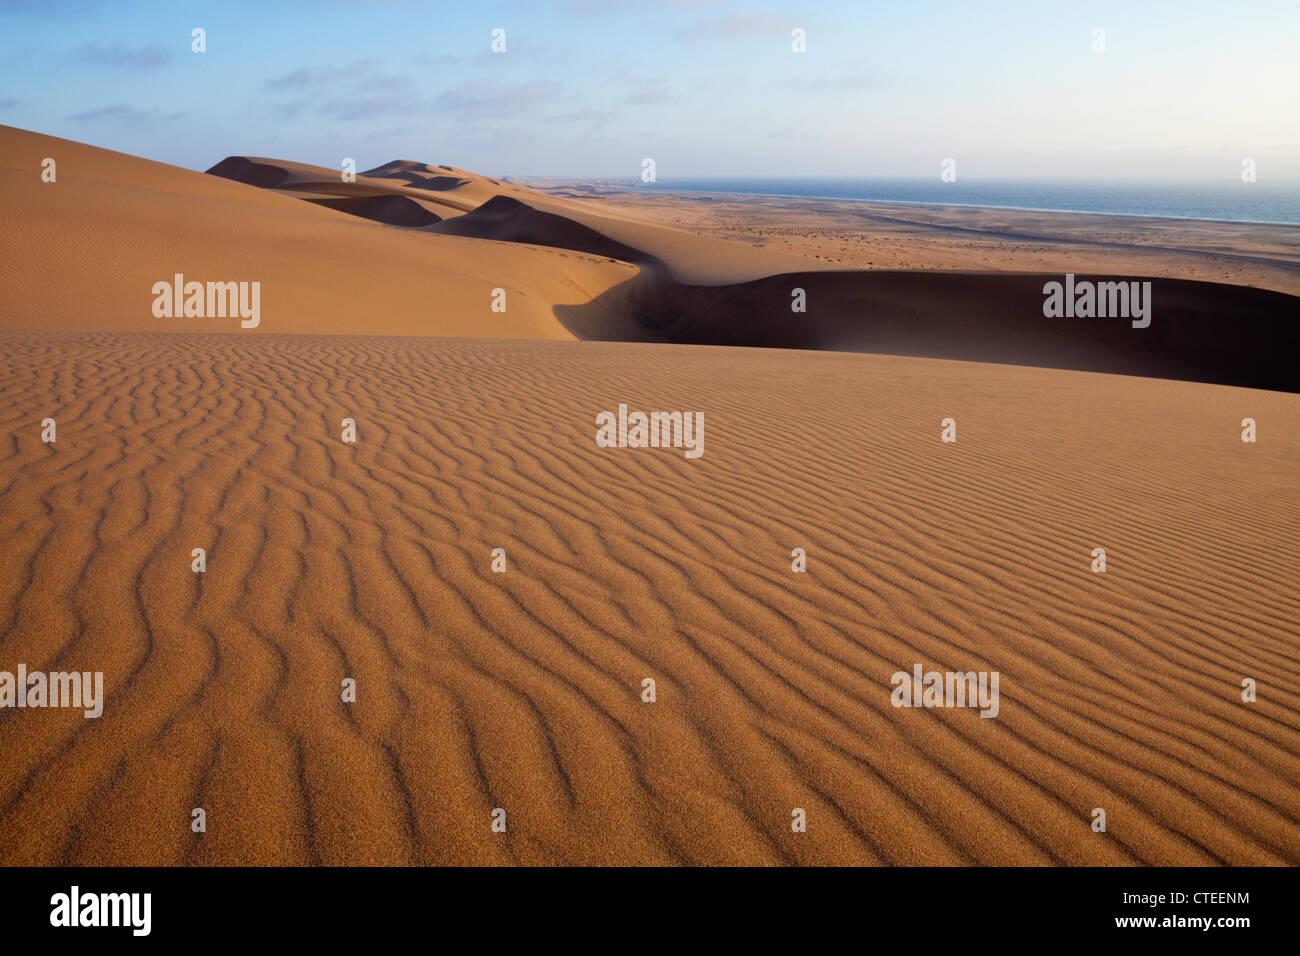 Sand Dunes of Namib Desert, Long Beach, Swakopmund, Namibia - Stock Image